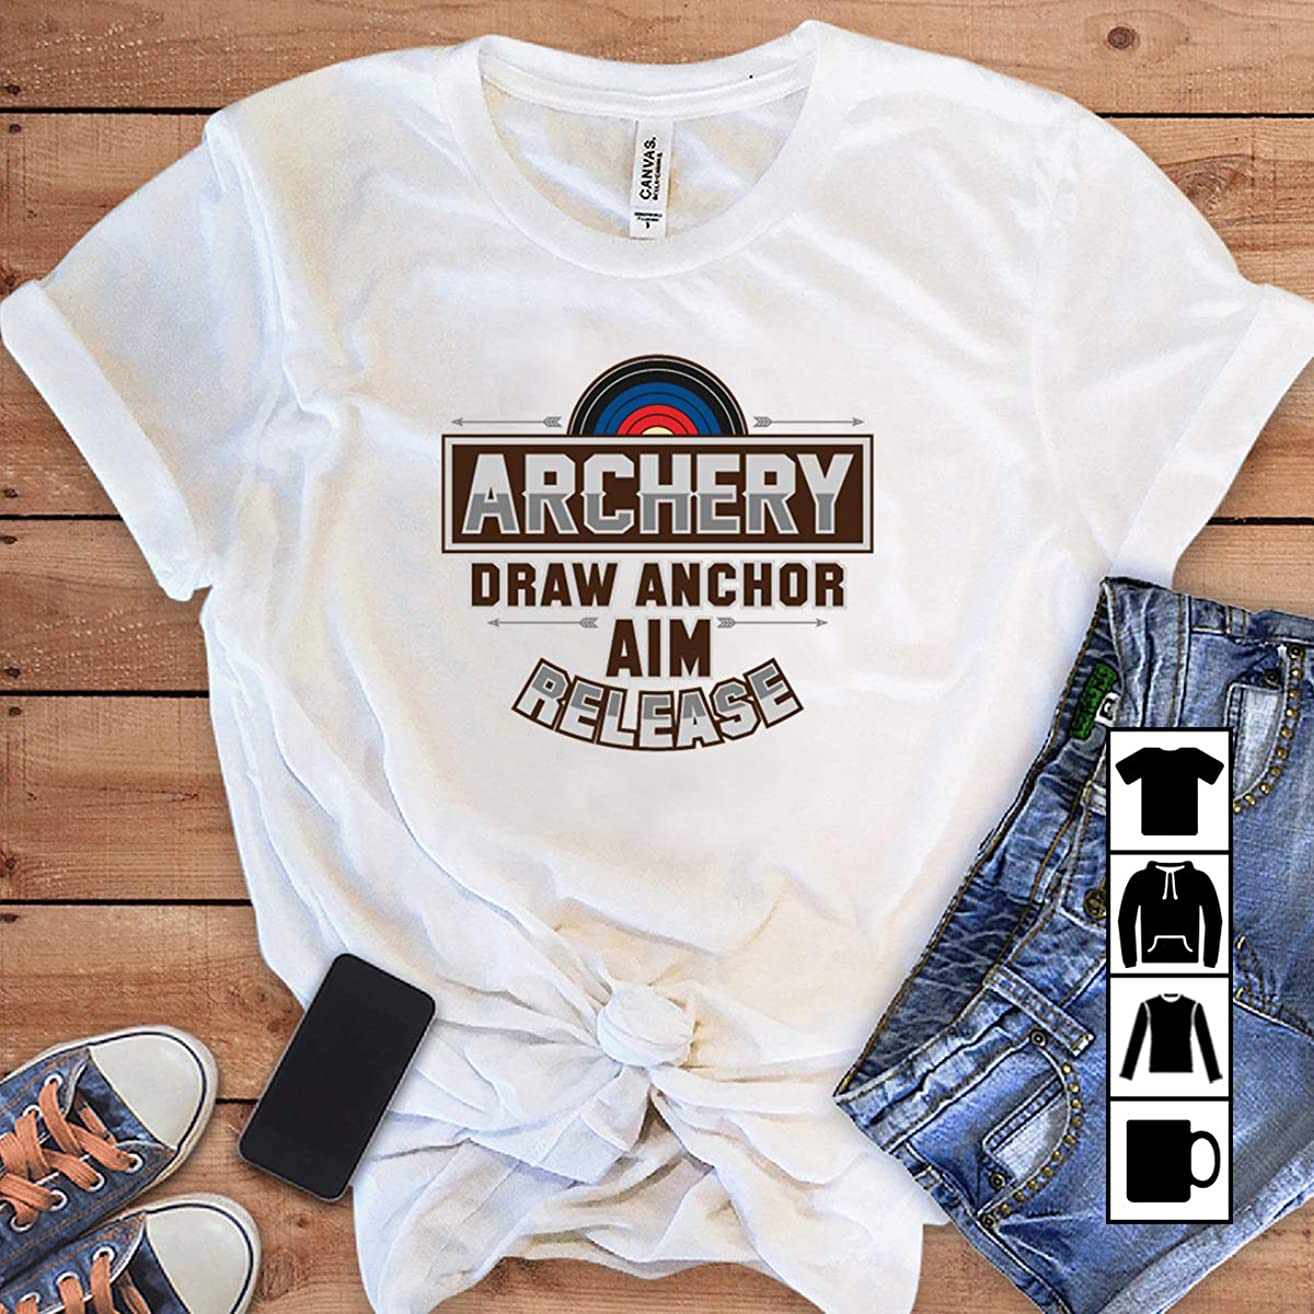 Bowman Archer Archery Draw Anchor Aim Release T Shirt Long Sleeve Sweatshirt Hoodie Youth